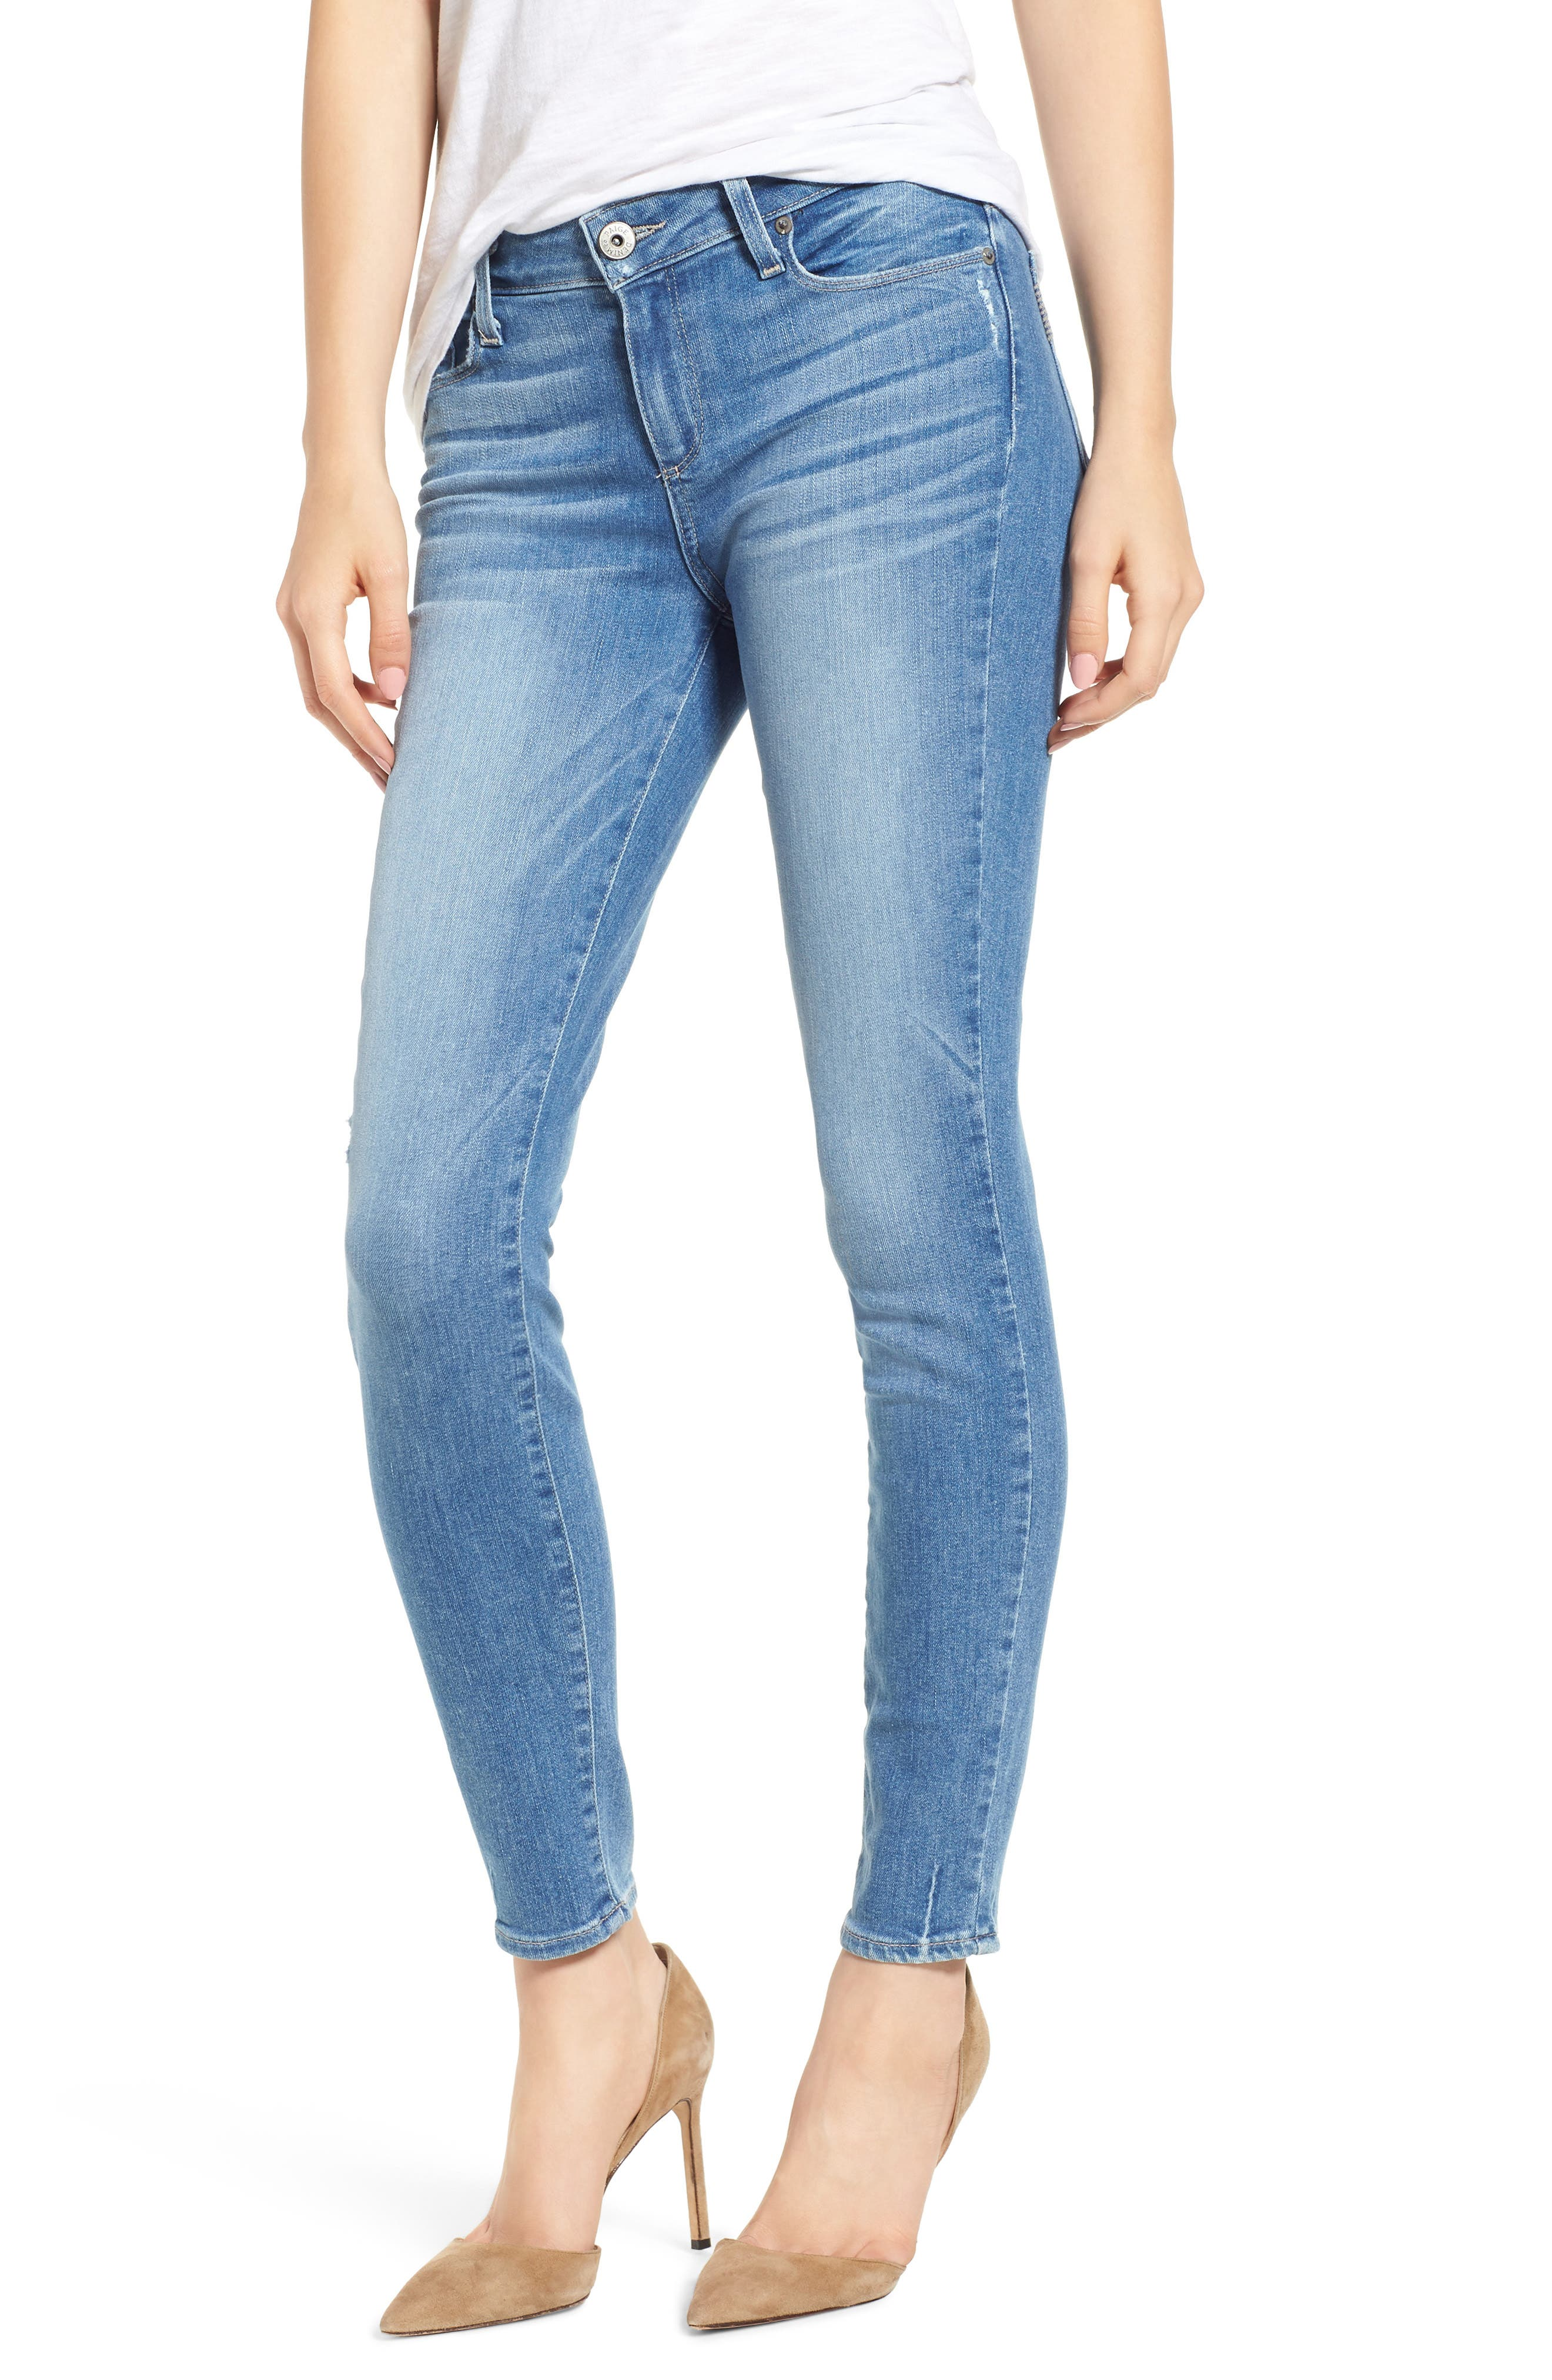 Transcend Vintage - Verdugo Ultra Skinny Jeans,                         Main,                         color, Atterbury